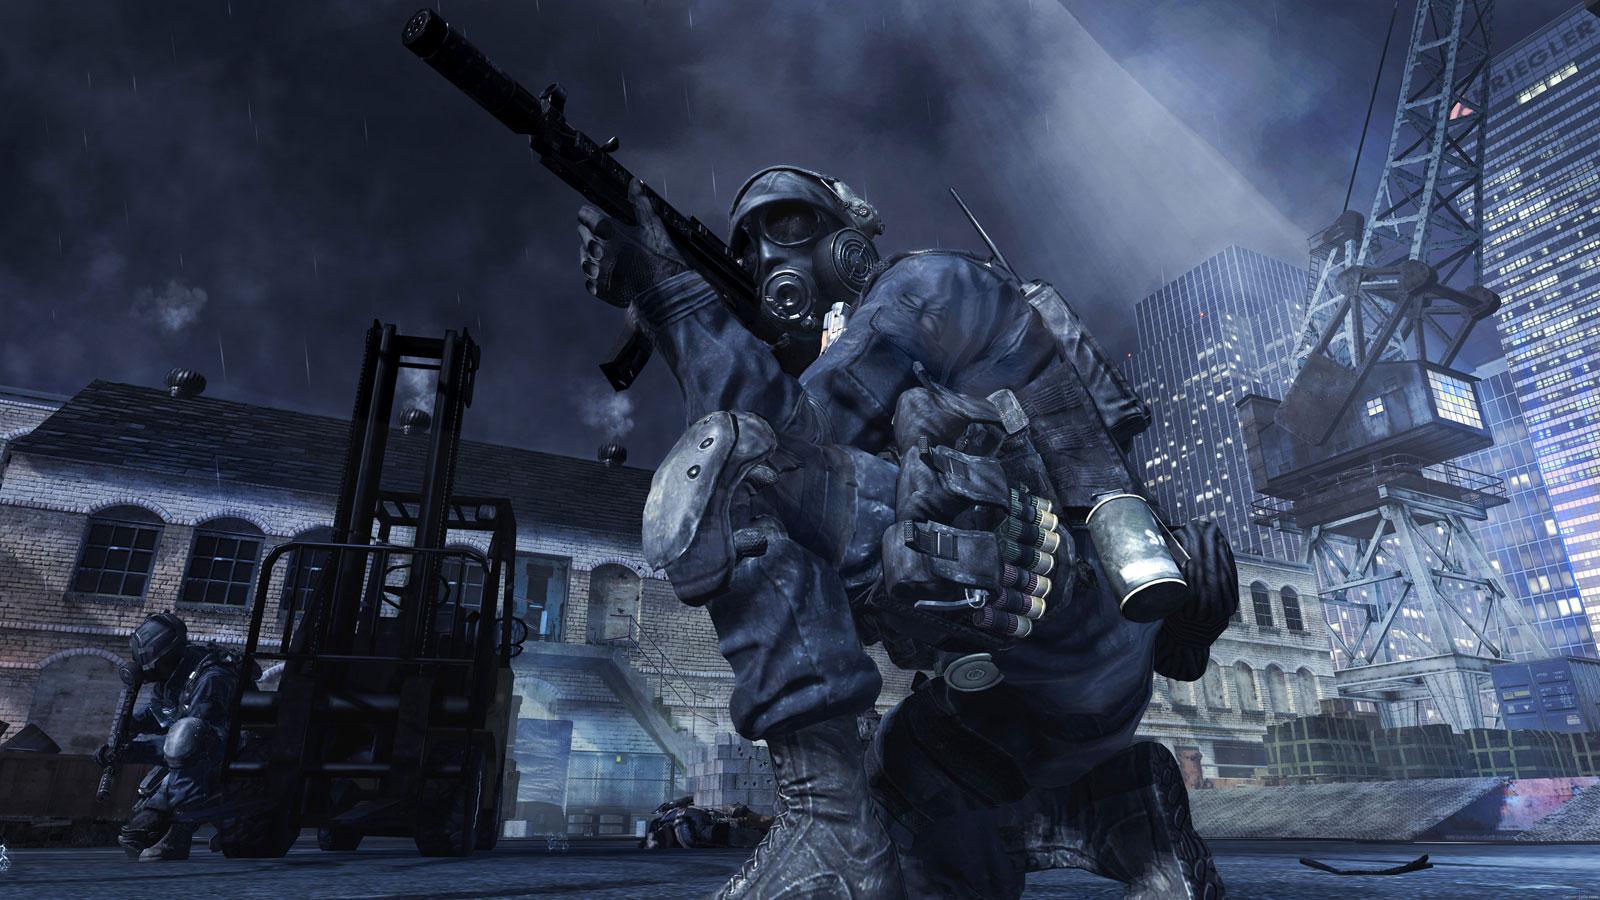 текстуры modern warfare 3: